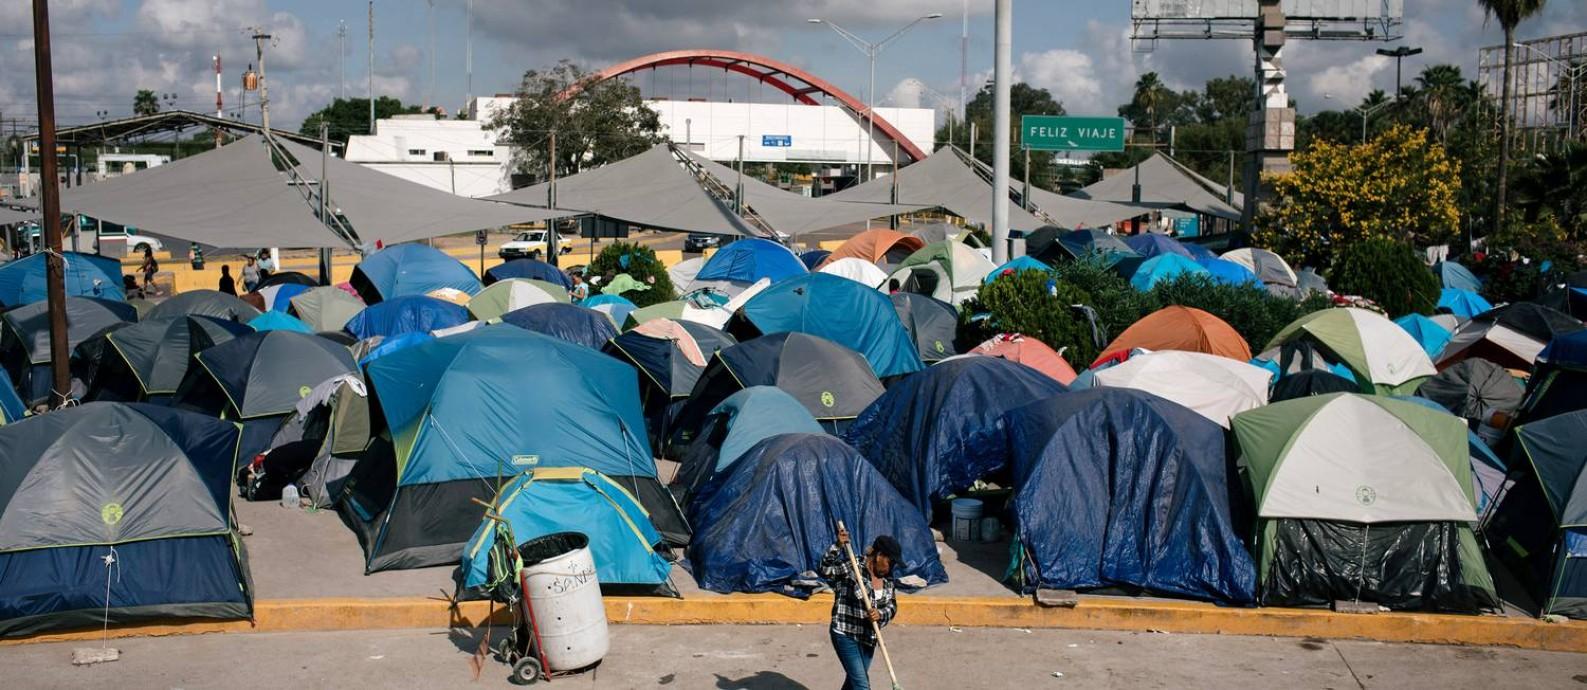 Acampamento improvisado de migrantes em Matamoros, no México Foto: ALYSSA SCHUKAR / NYT